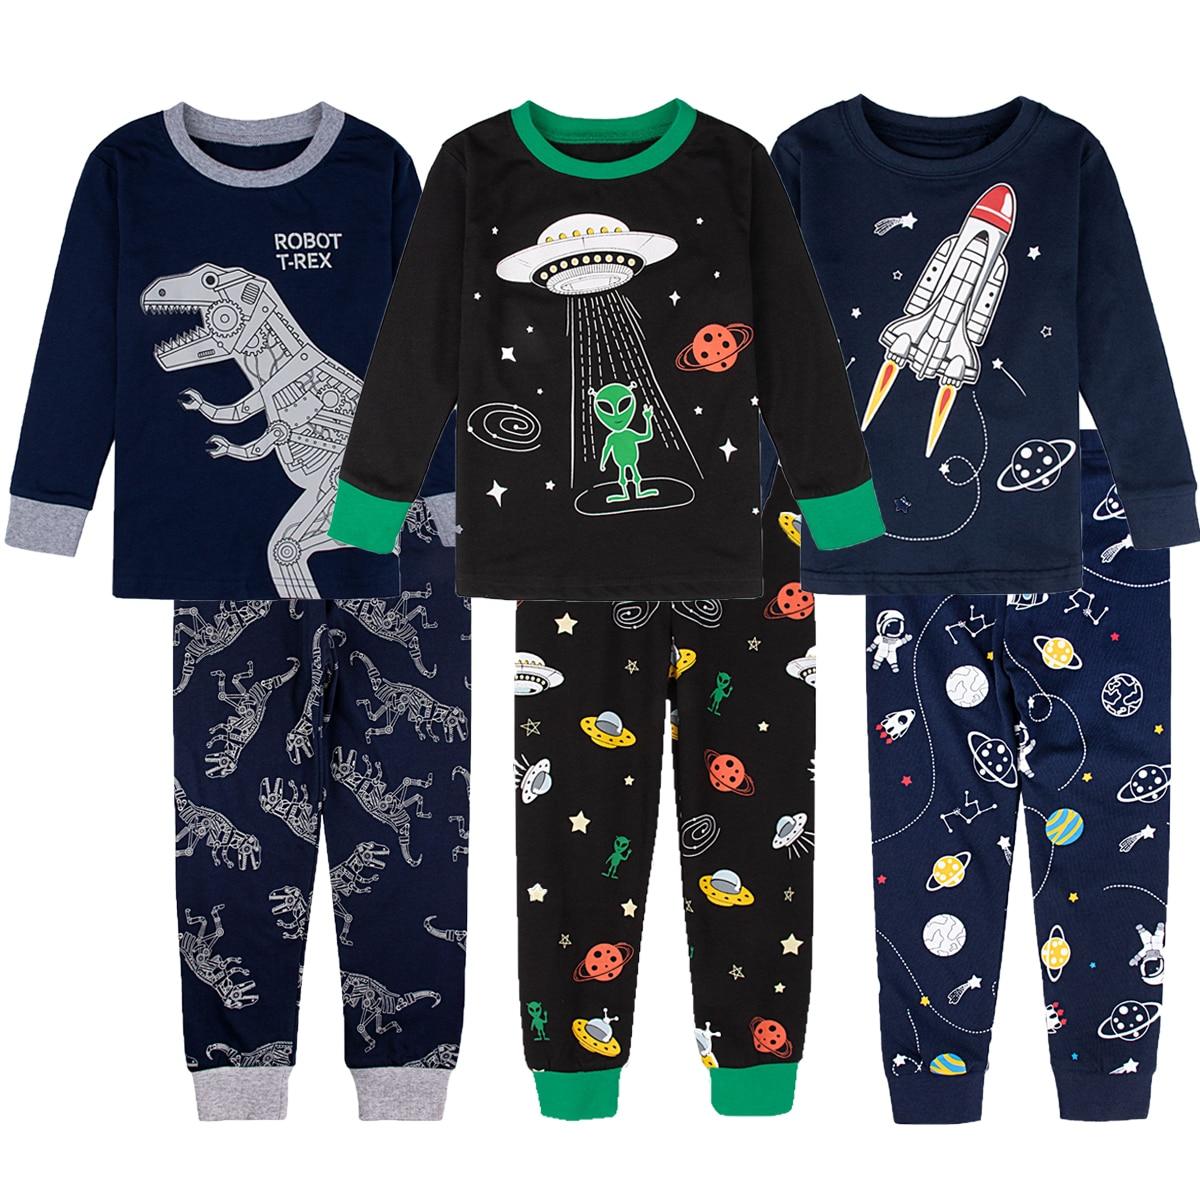 Kids Boy Captain Hulk Spiderman Superhero Pajamas Set Children Avenger Ironman Sleepwear Toddler Christmas Cosplay Costume 2-10Y